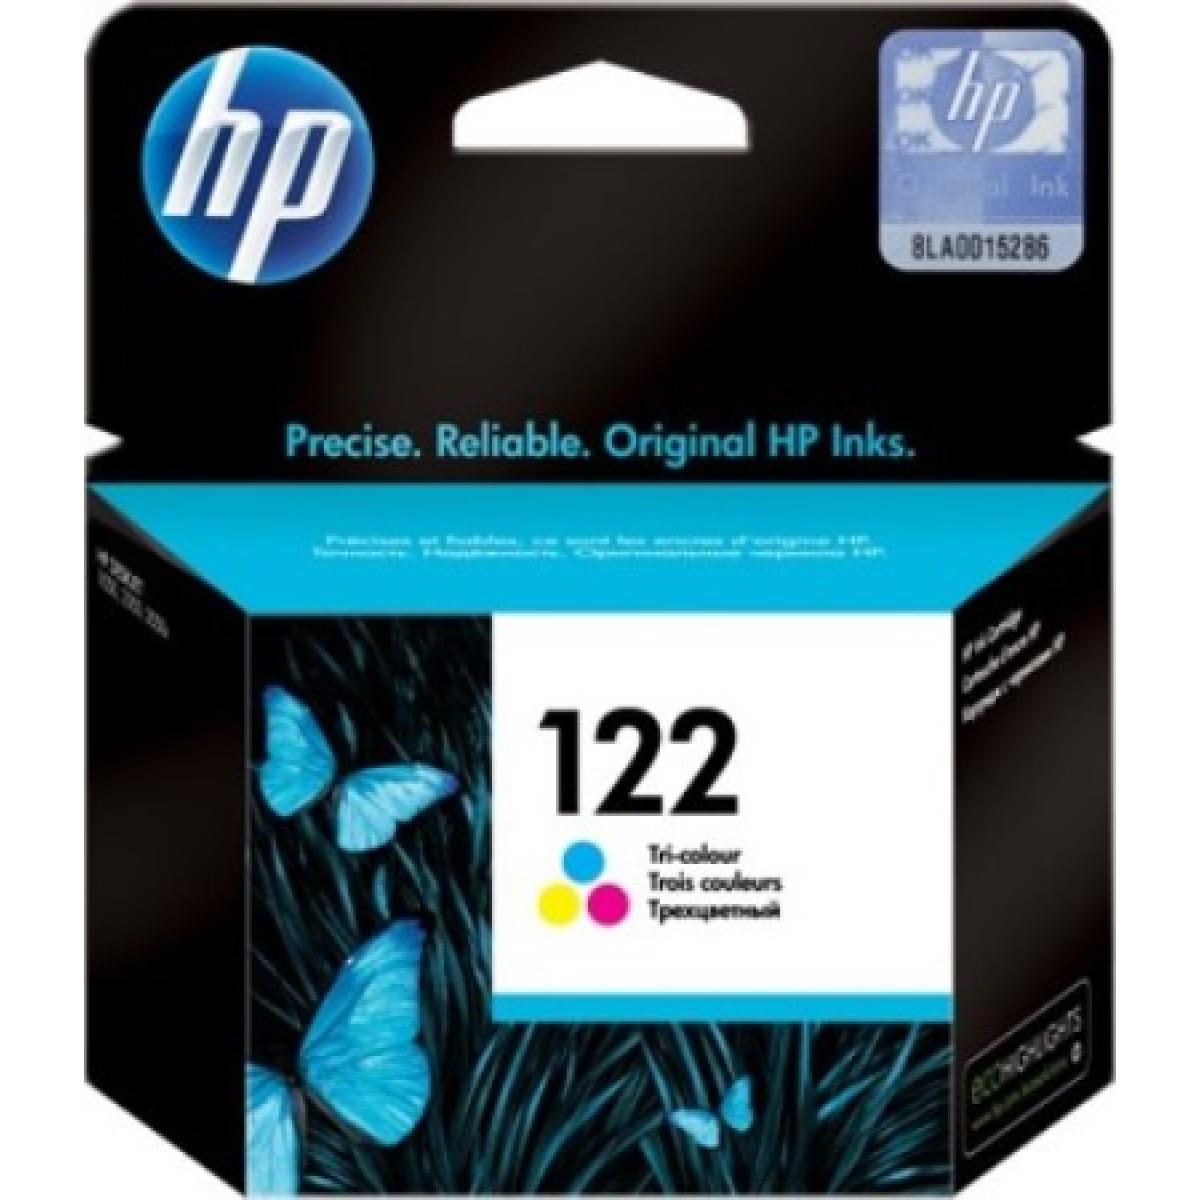 Hp Ink Cartridge 122 Color Gts Amman Jordan